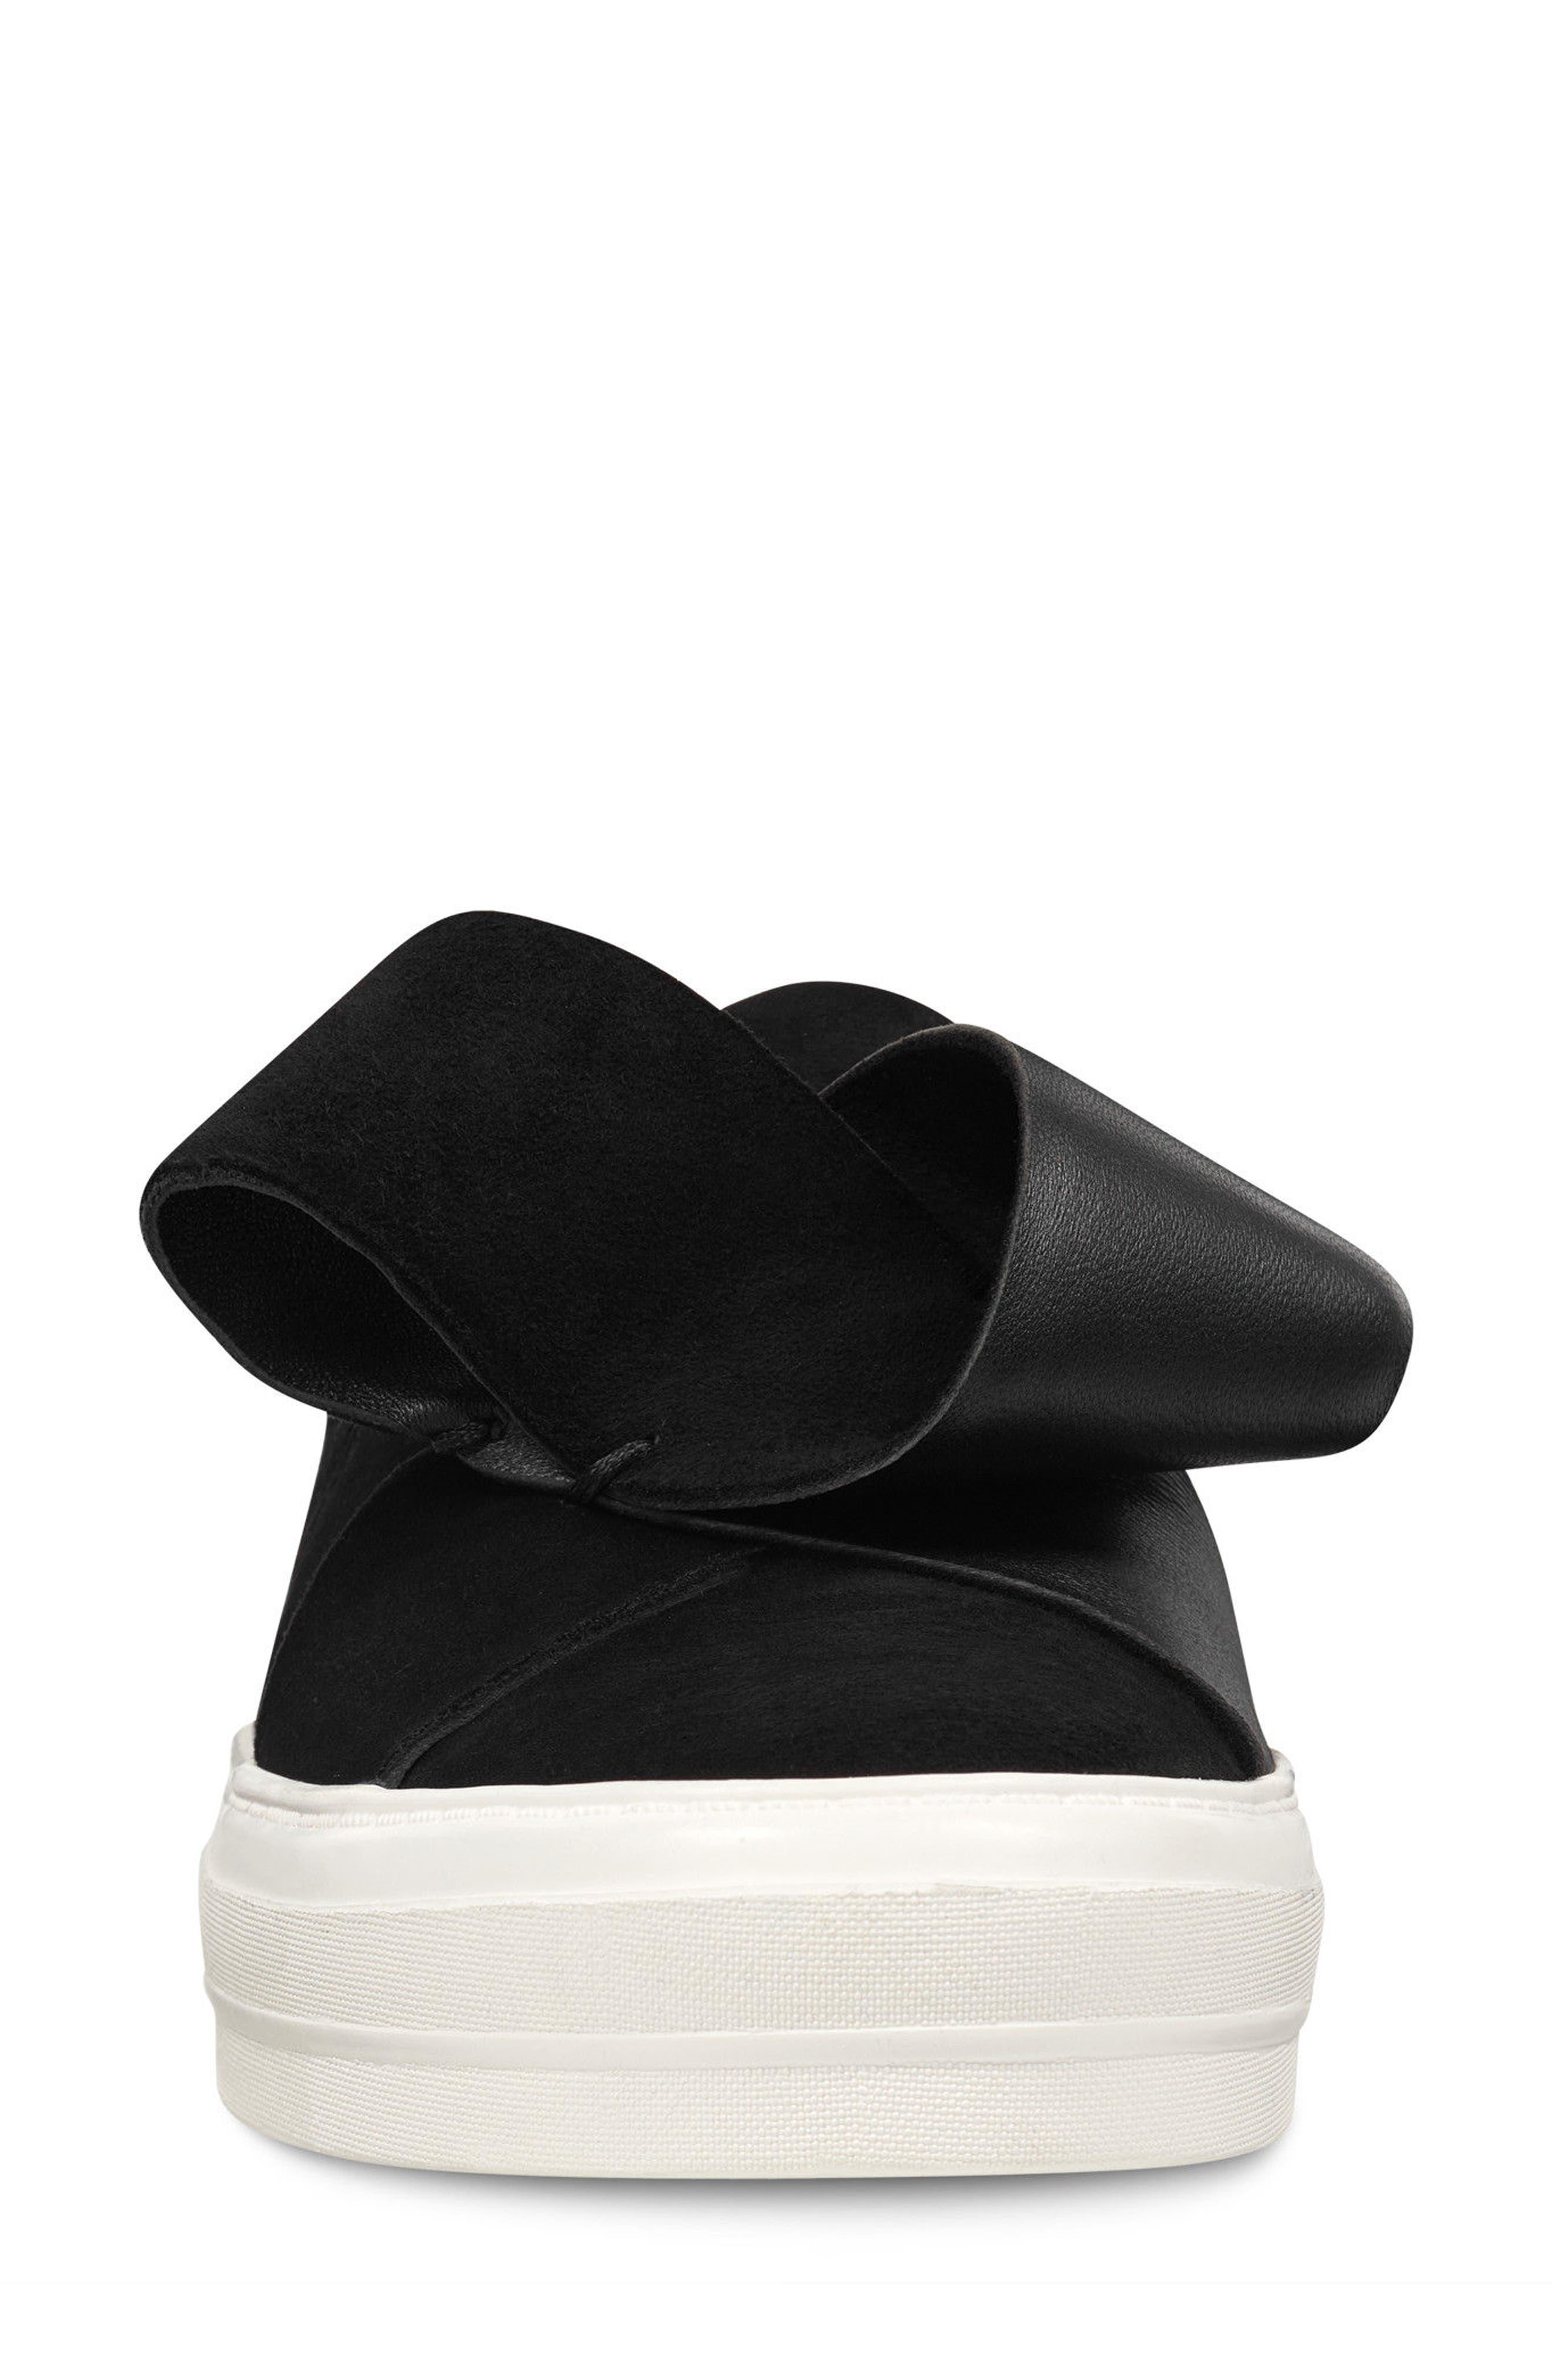 Odienella Slip-On Sneaker,                             Alternate thumbnail 4, color,                             BLACK MULTI SUEDE